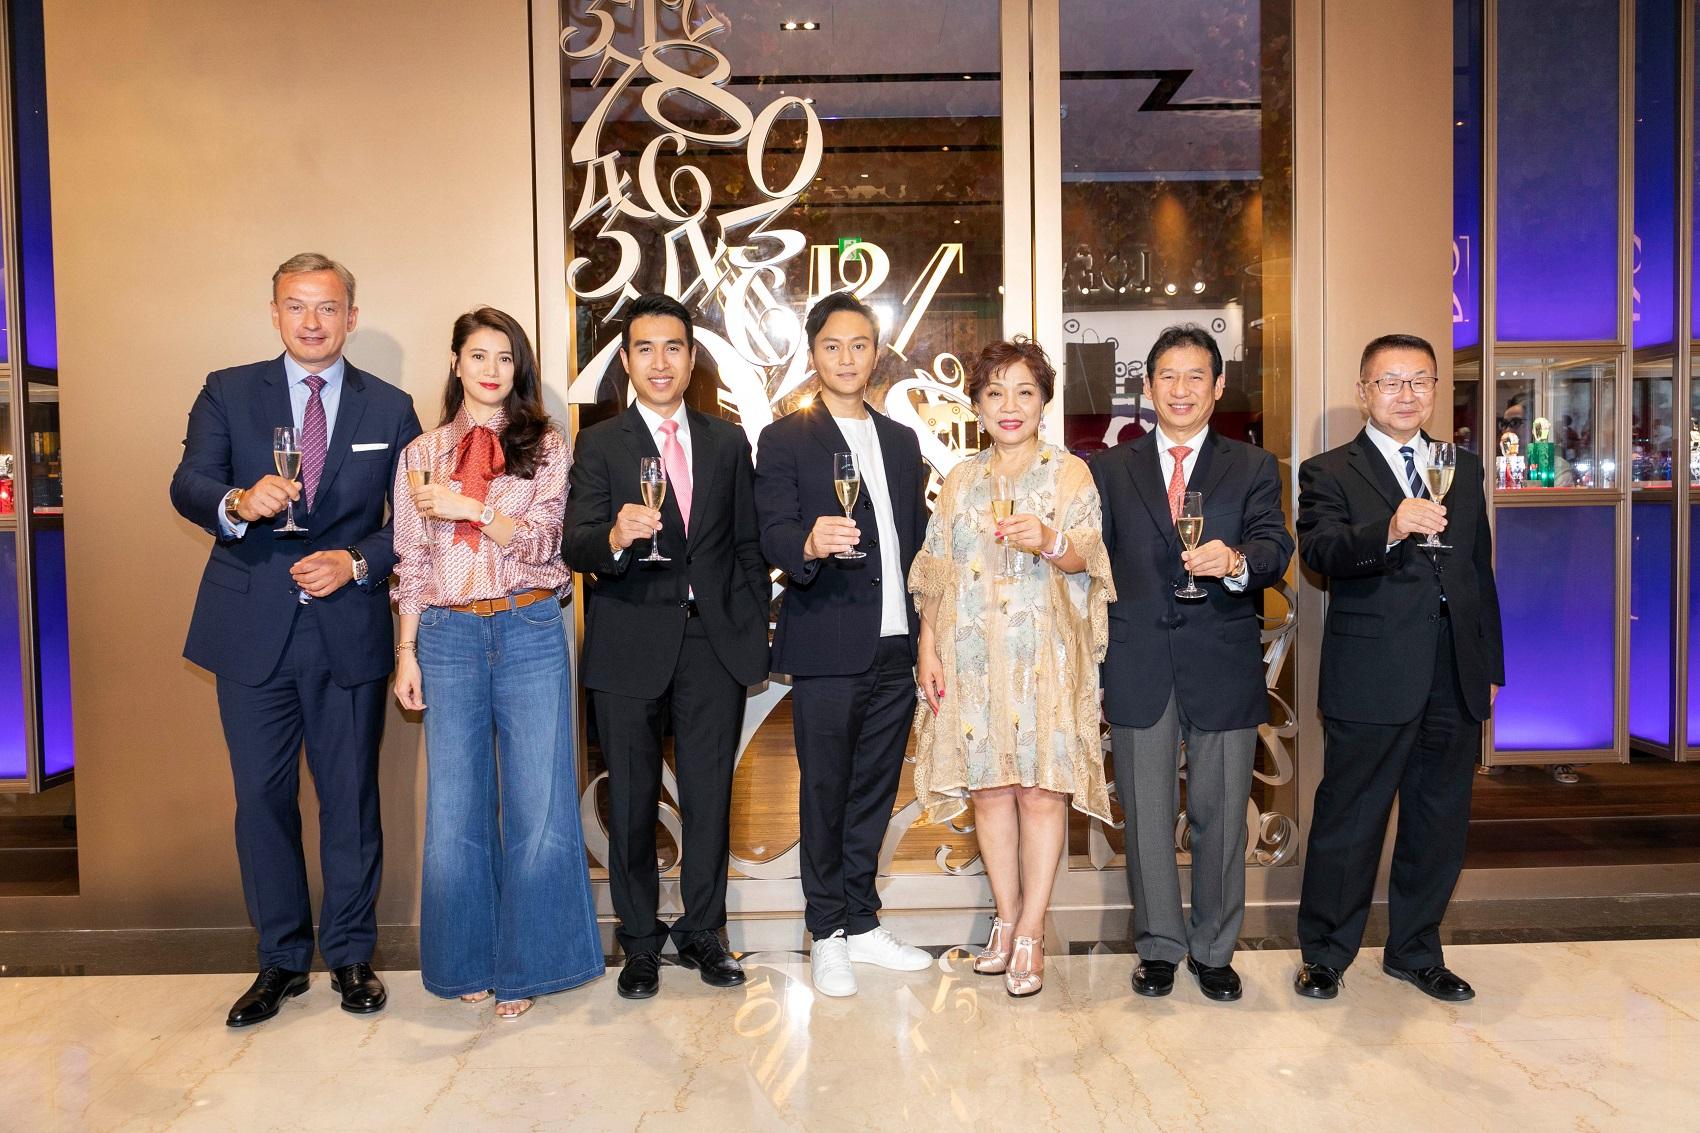 Franck Muller Breeze Nan Shan Boutique Opening_2.jpg